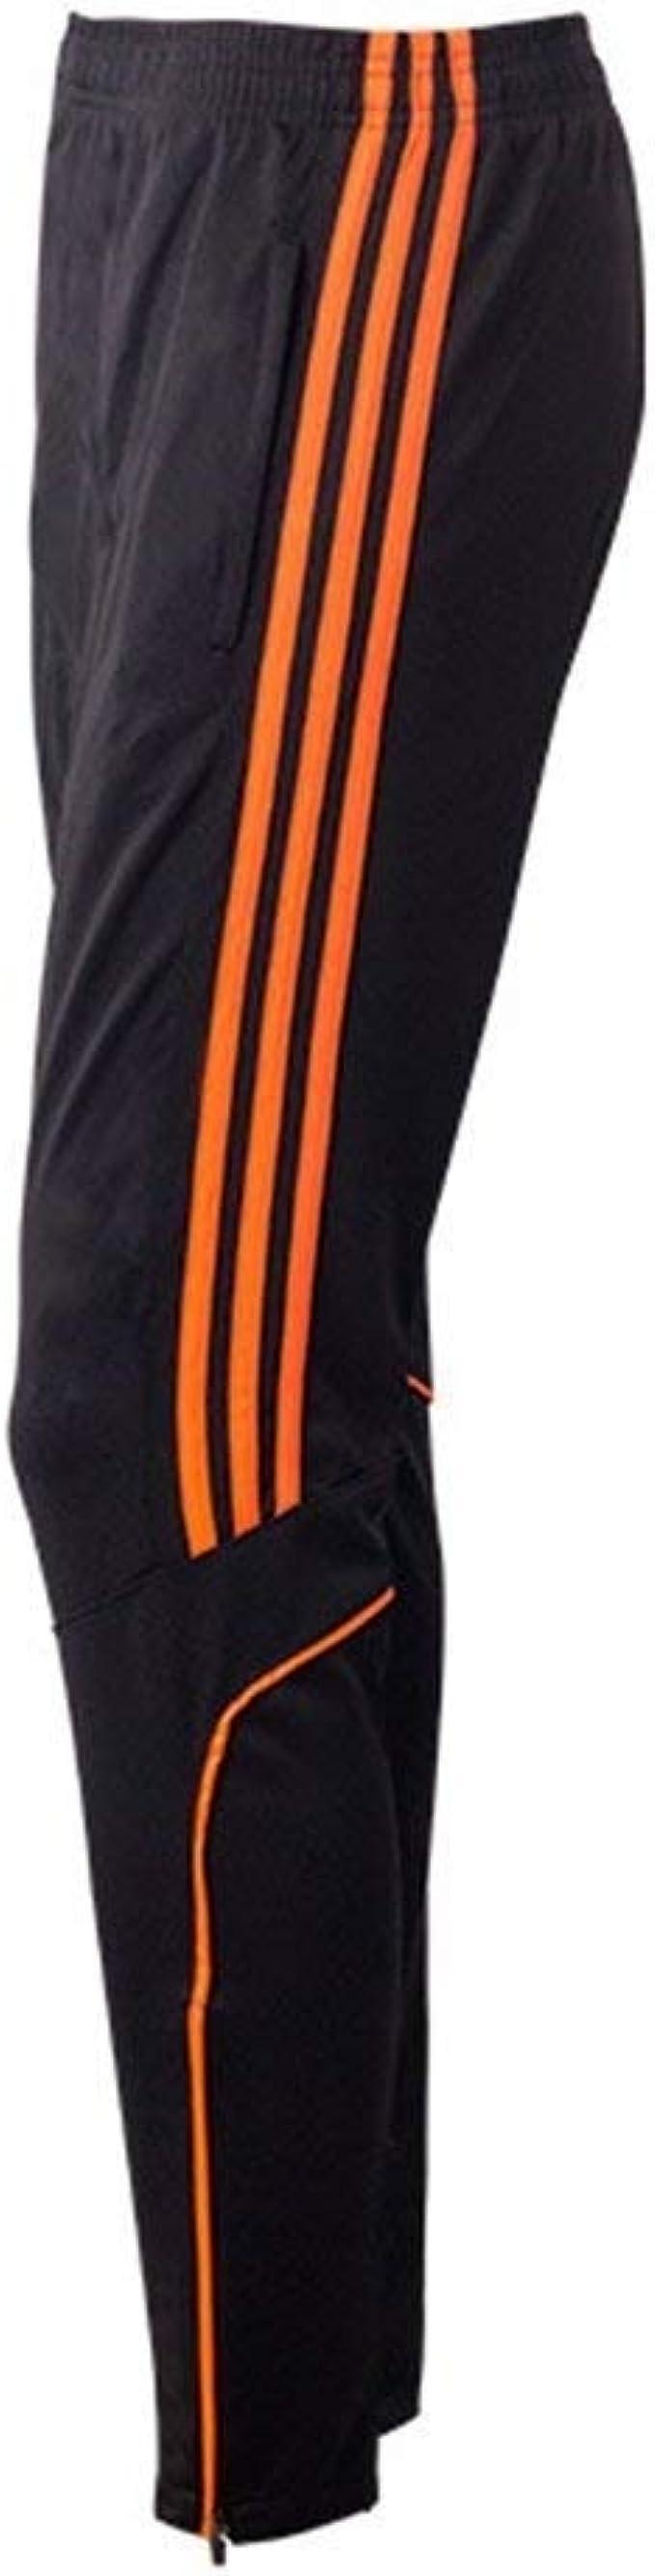 Anaisy Pantalones De Fitness para Hombres Pantalones De Pantalones ...